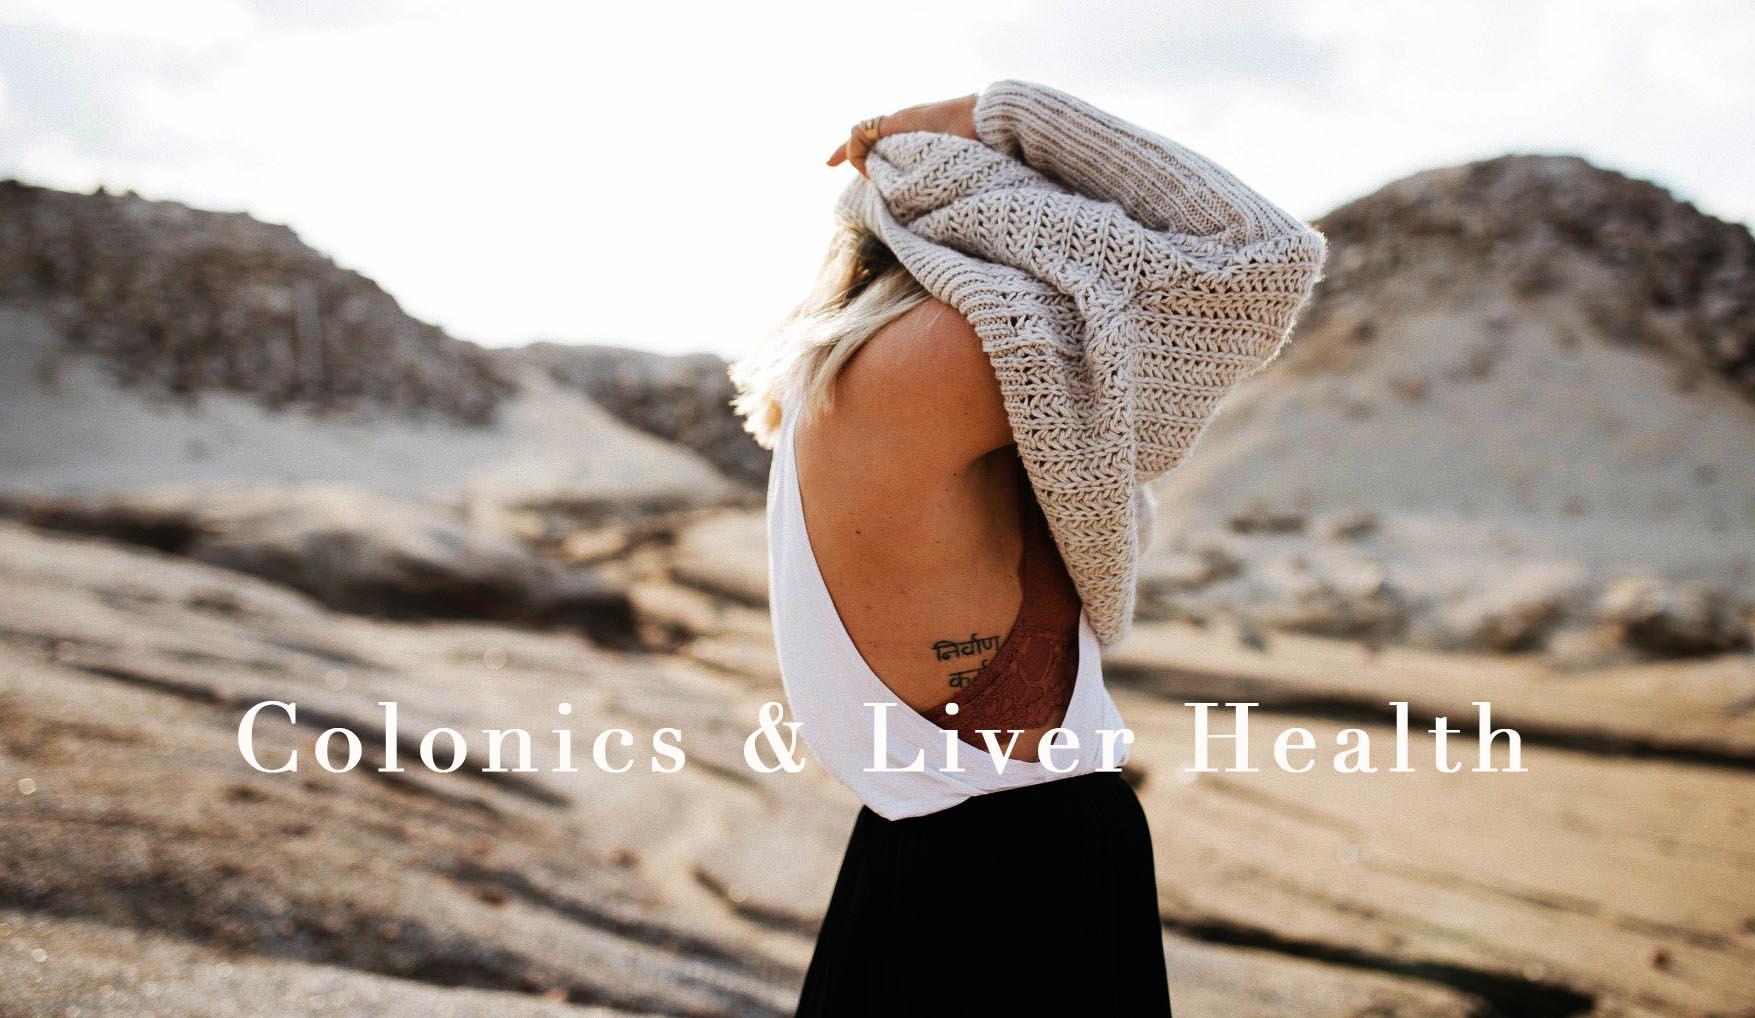 Colonics & Liver Health